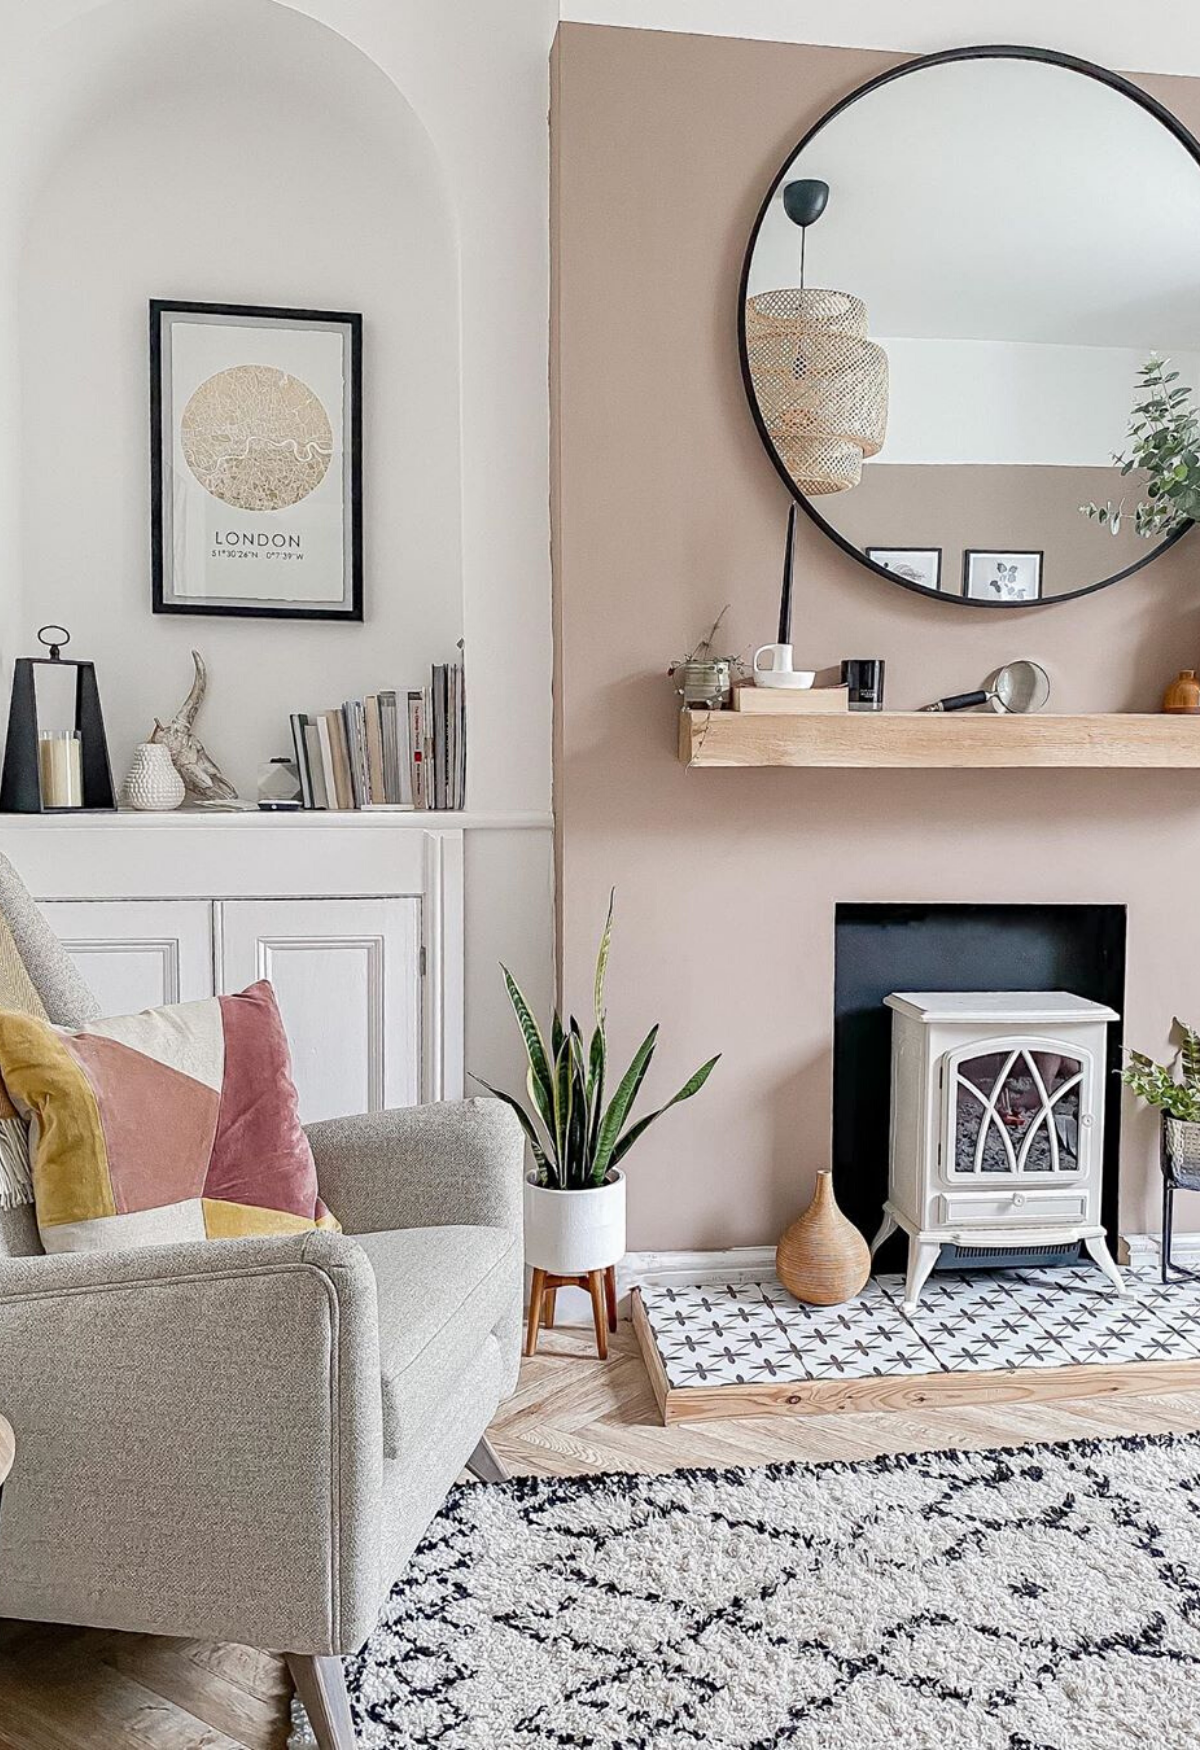 Scandinavian And Nordic Design Inspiration Rooms Solutions In 2020 Nordic Living Room Interior Design Principles Scandinavian Interior Design